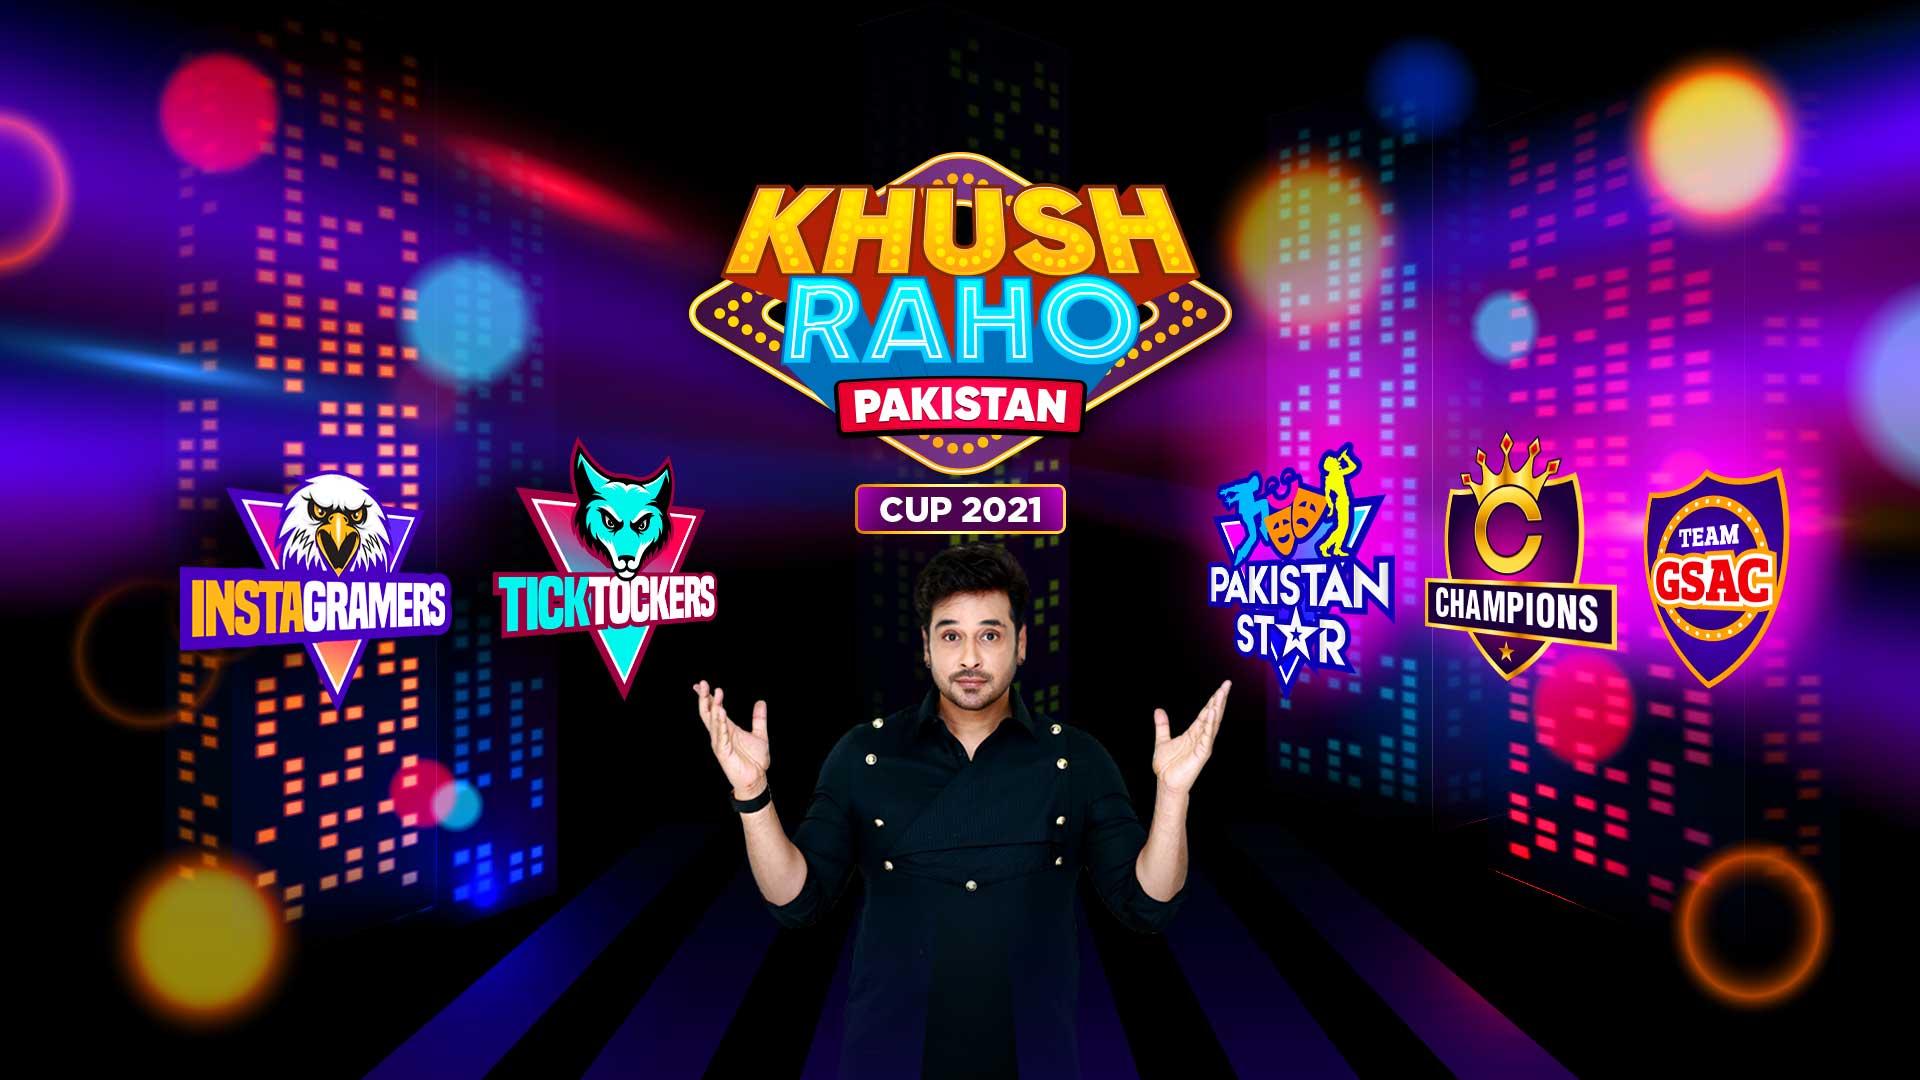 Khush Raho Pakistan - Pakistan Cup